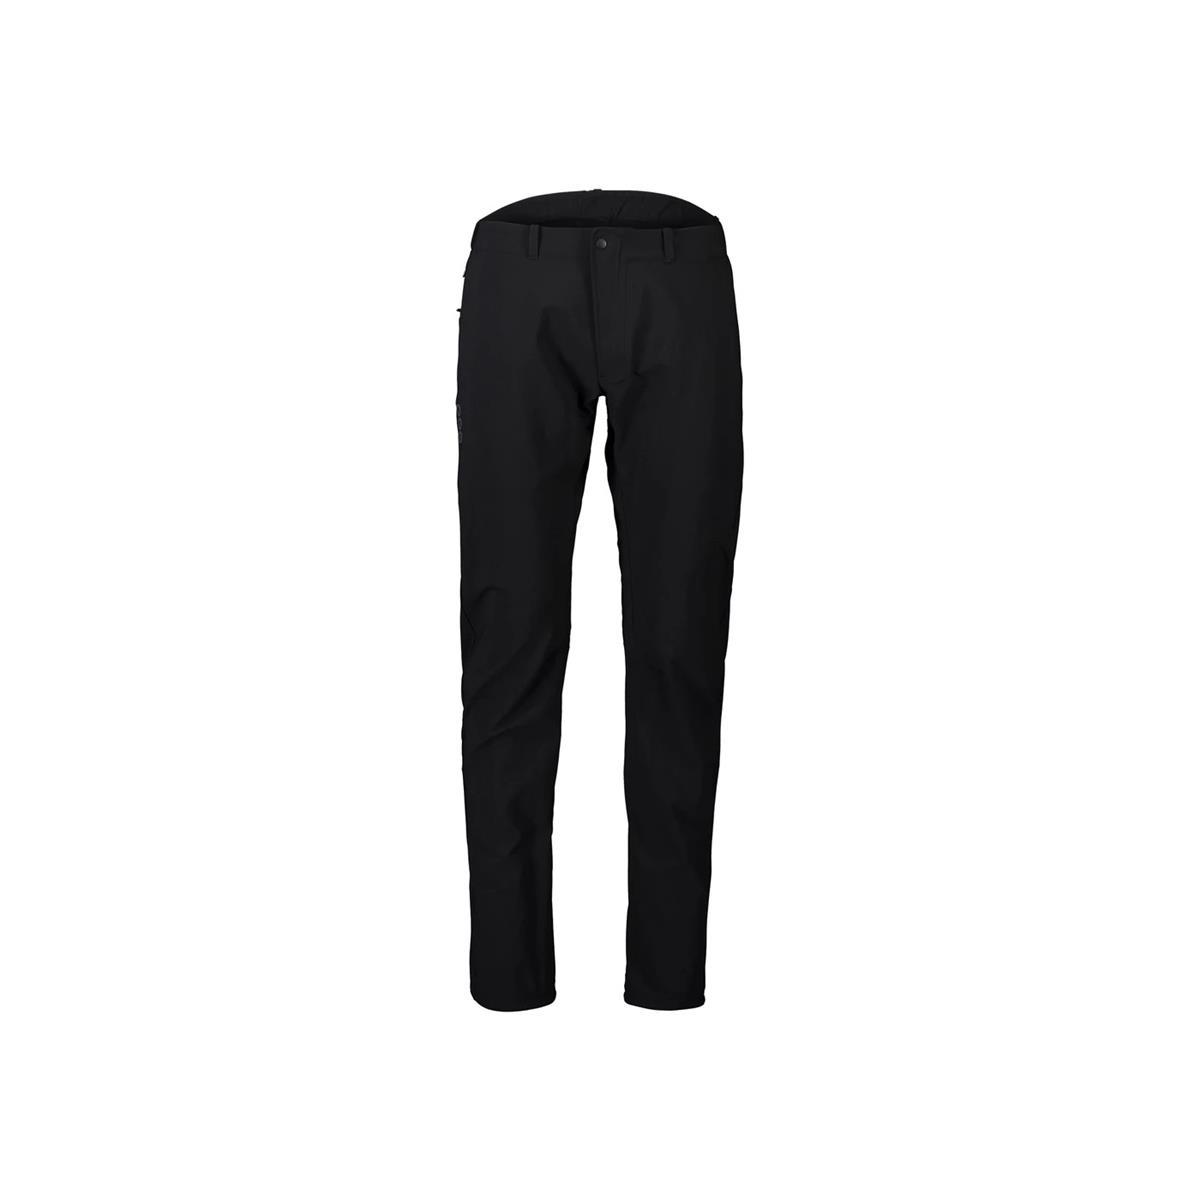 Pantaloni Transcend Uomo Nero Taglia XS